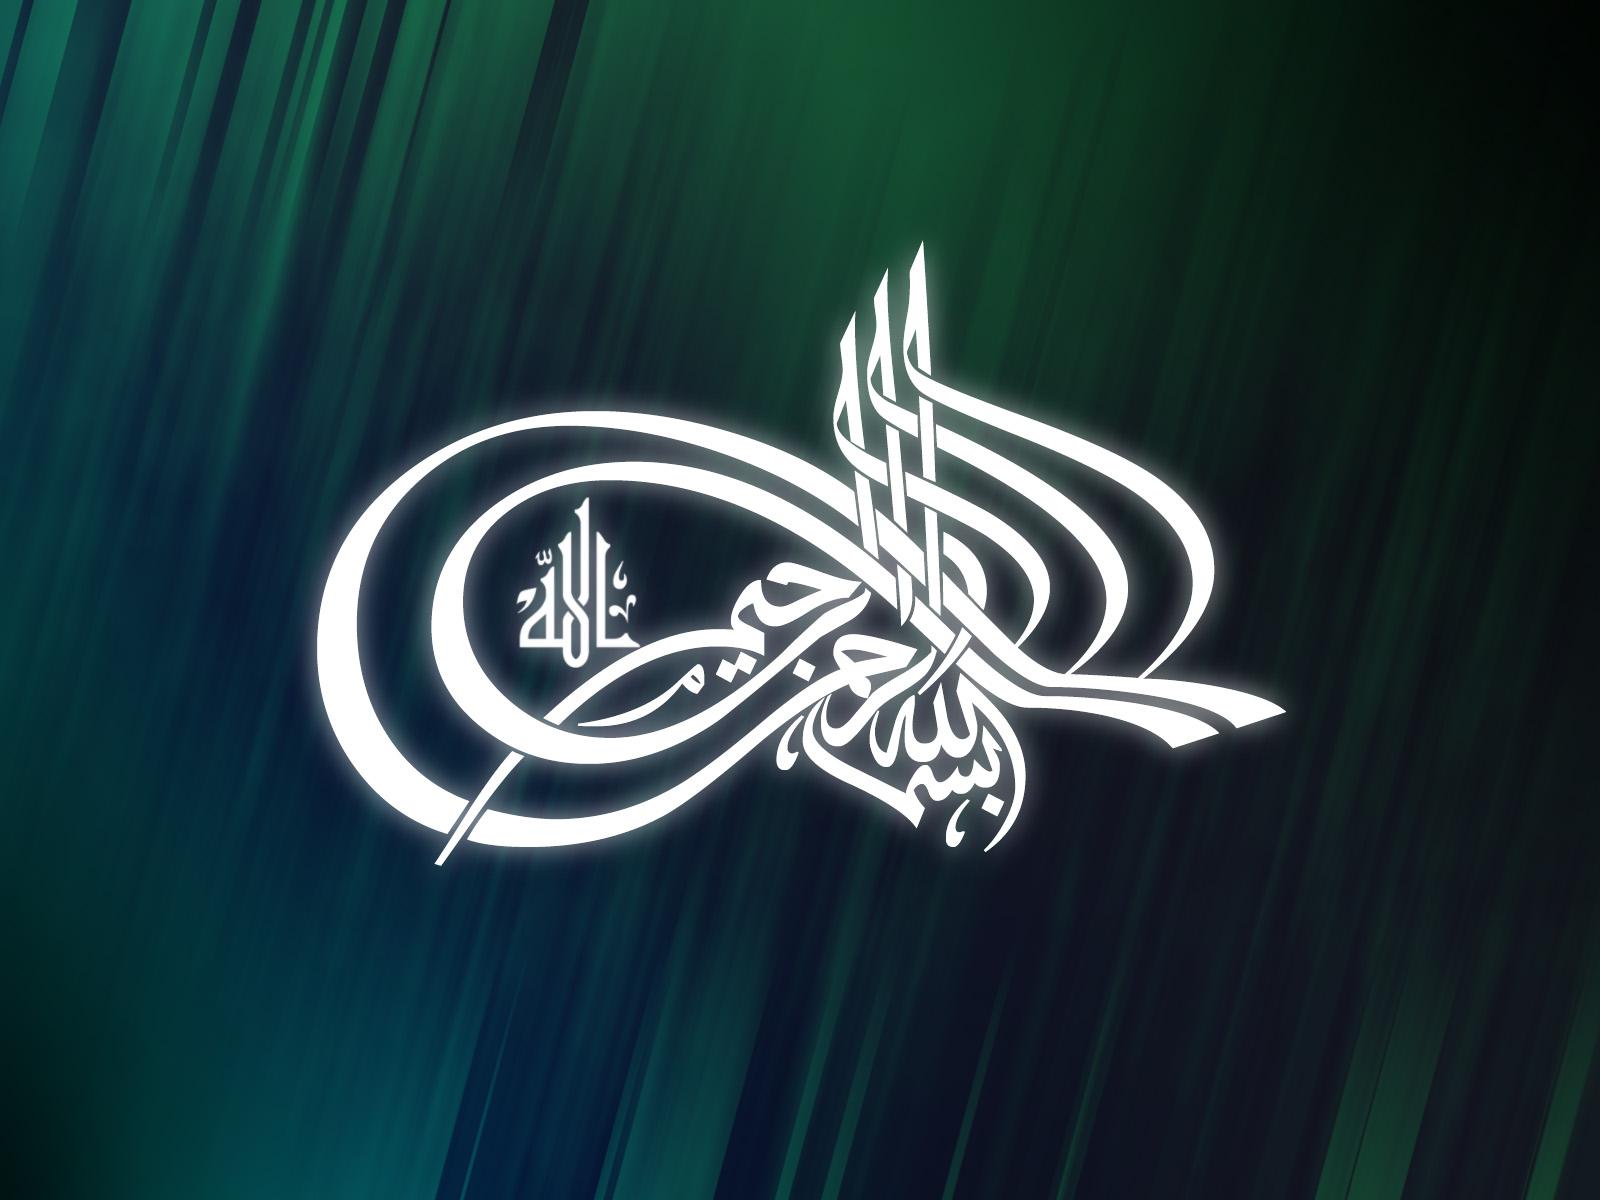 Wallpaper: Gambar Wallpaper Islam